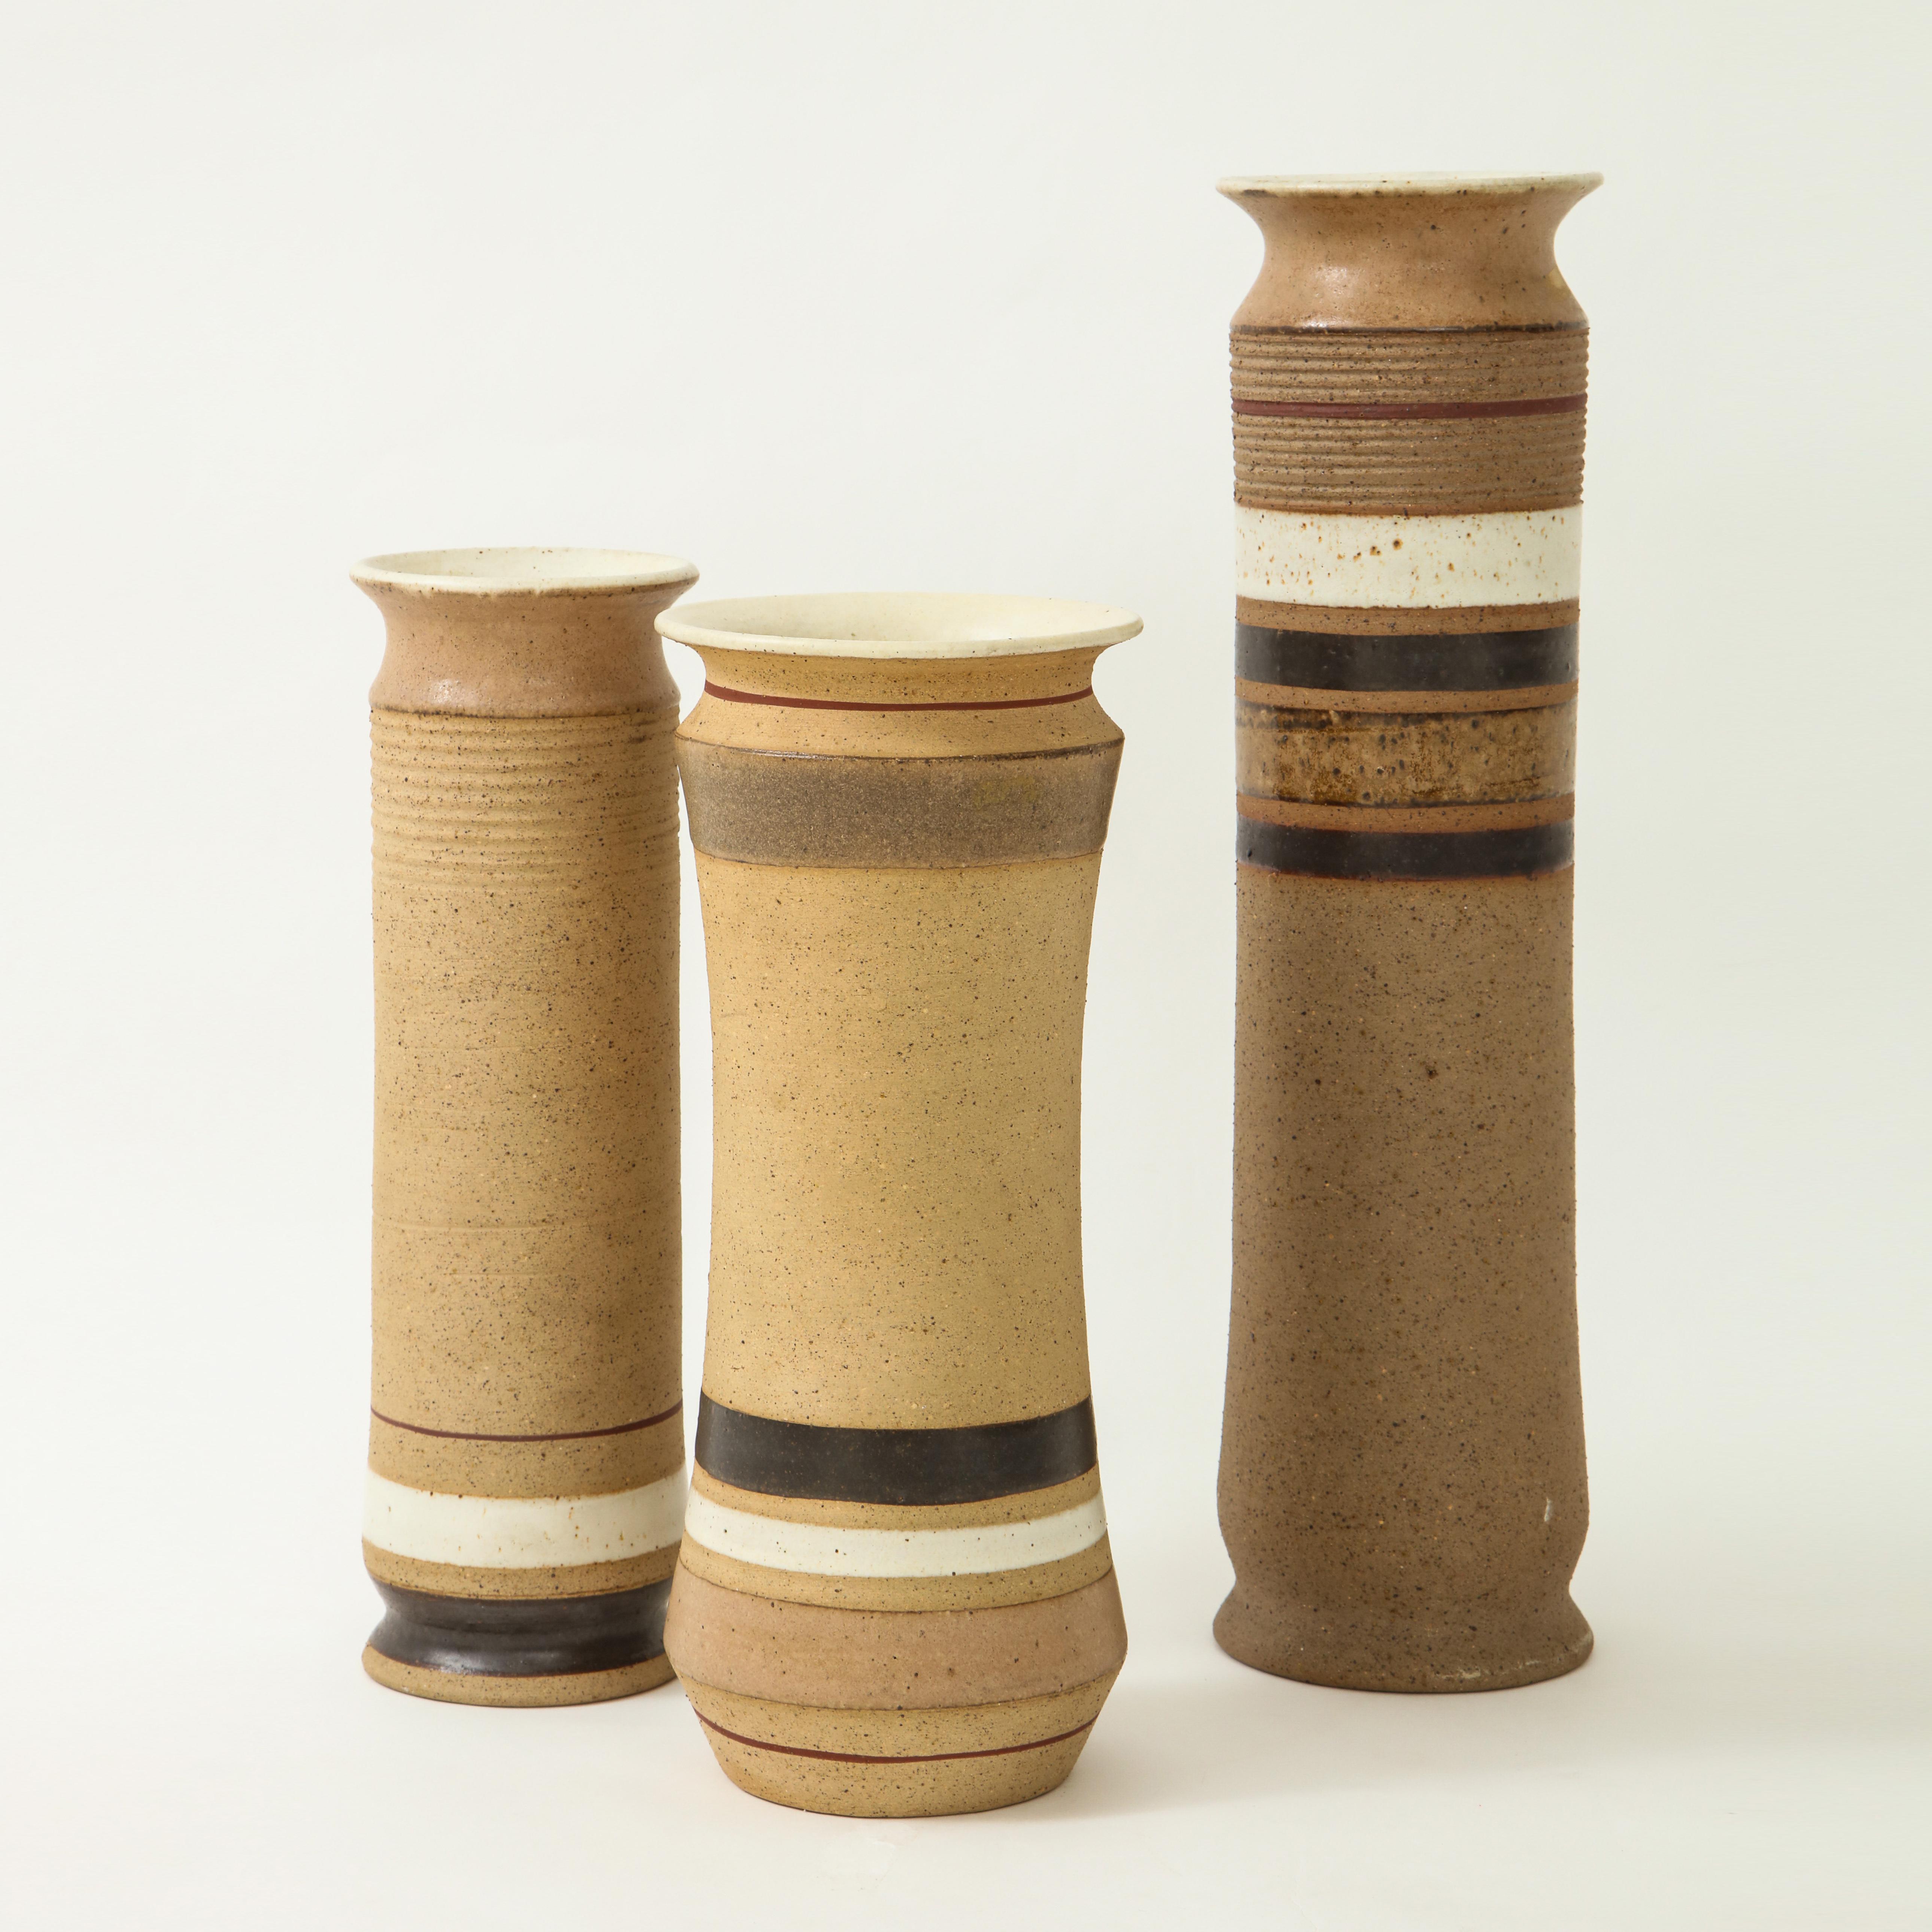 Set of 3 Ceramic Vases by Bruno Gambone | soyun k.